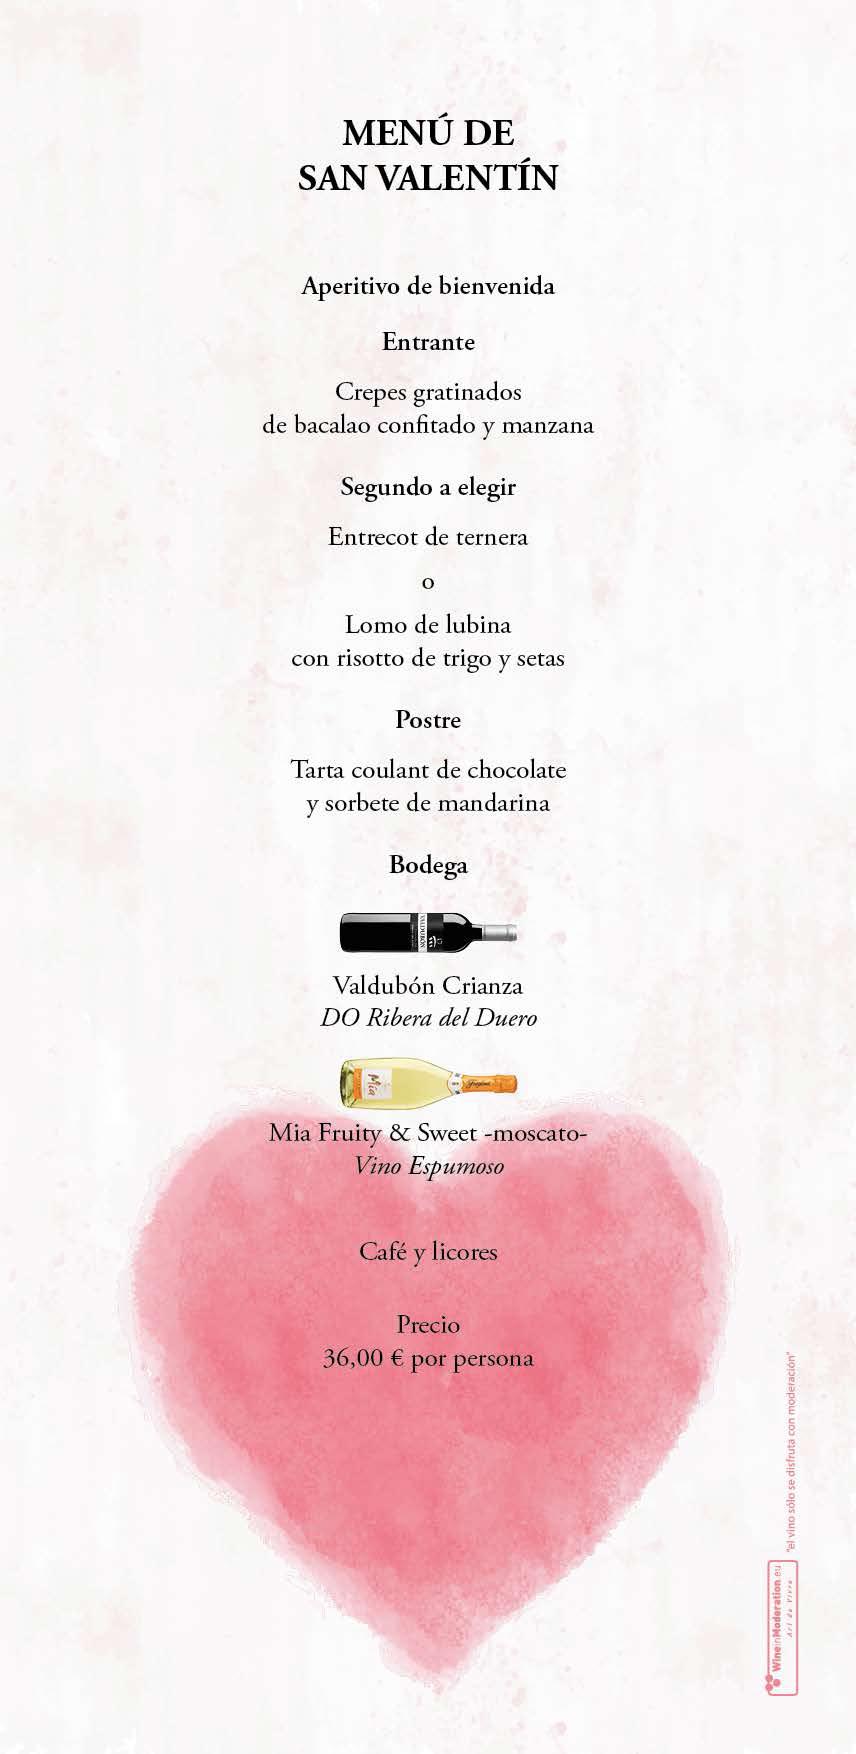 Noches de San Valentín 2019